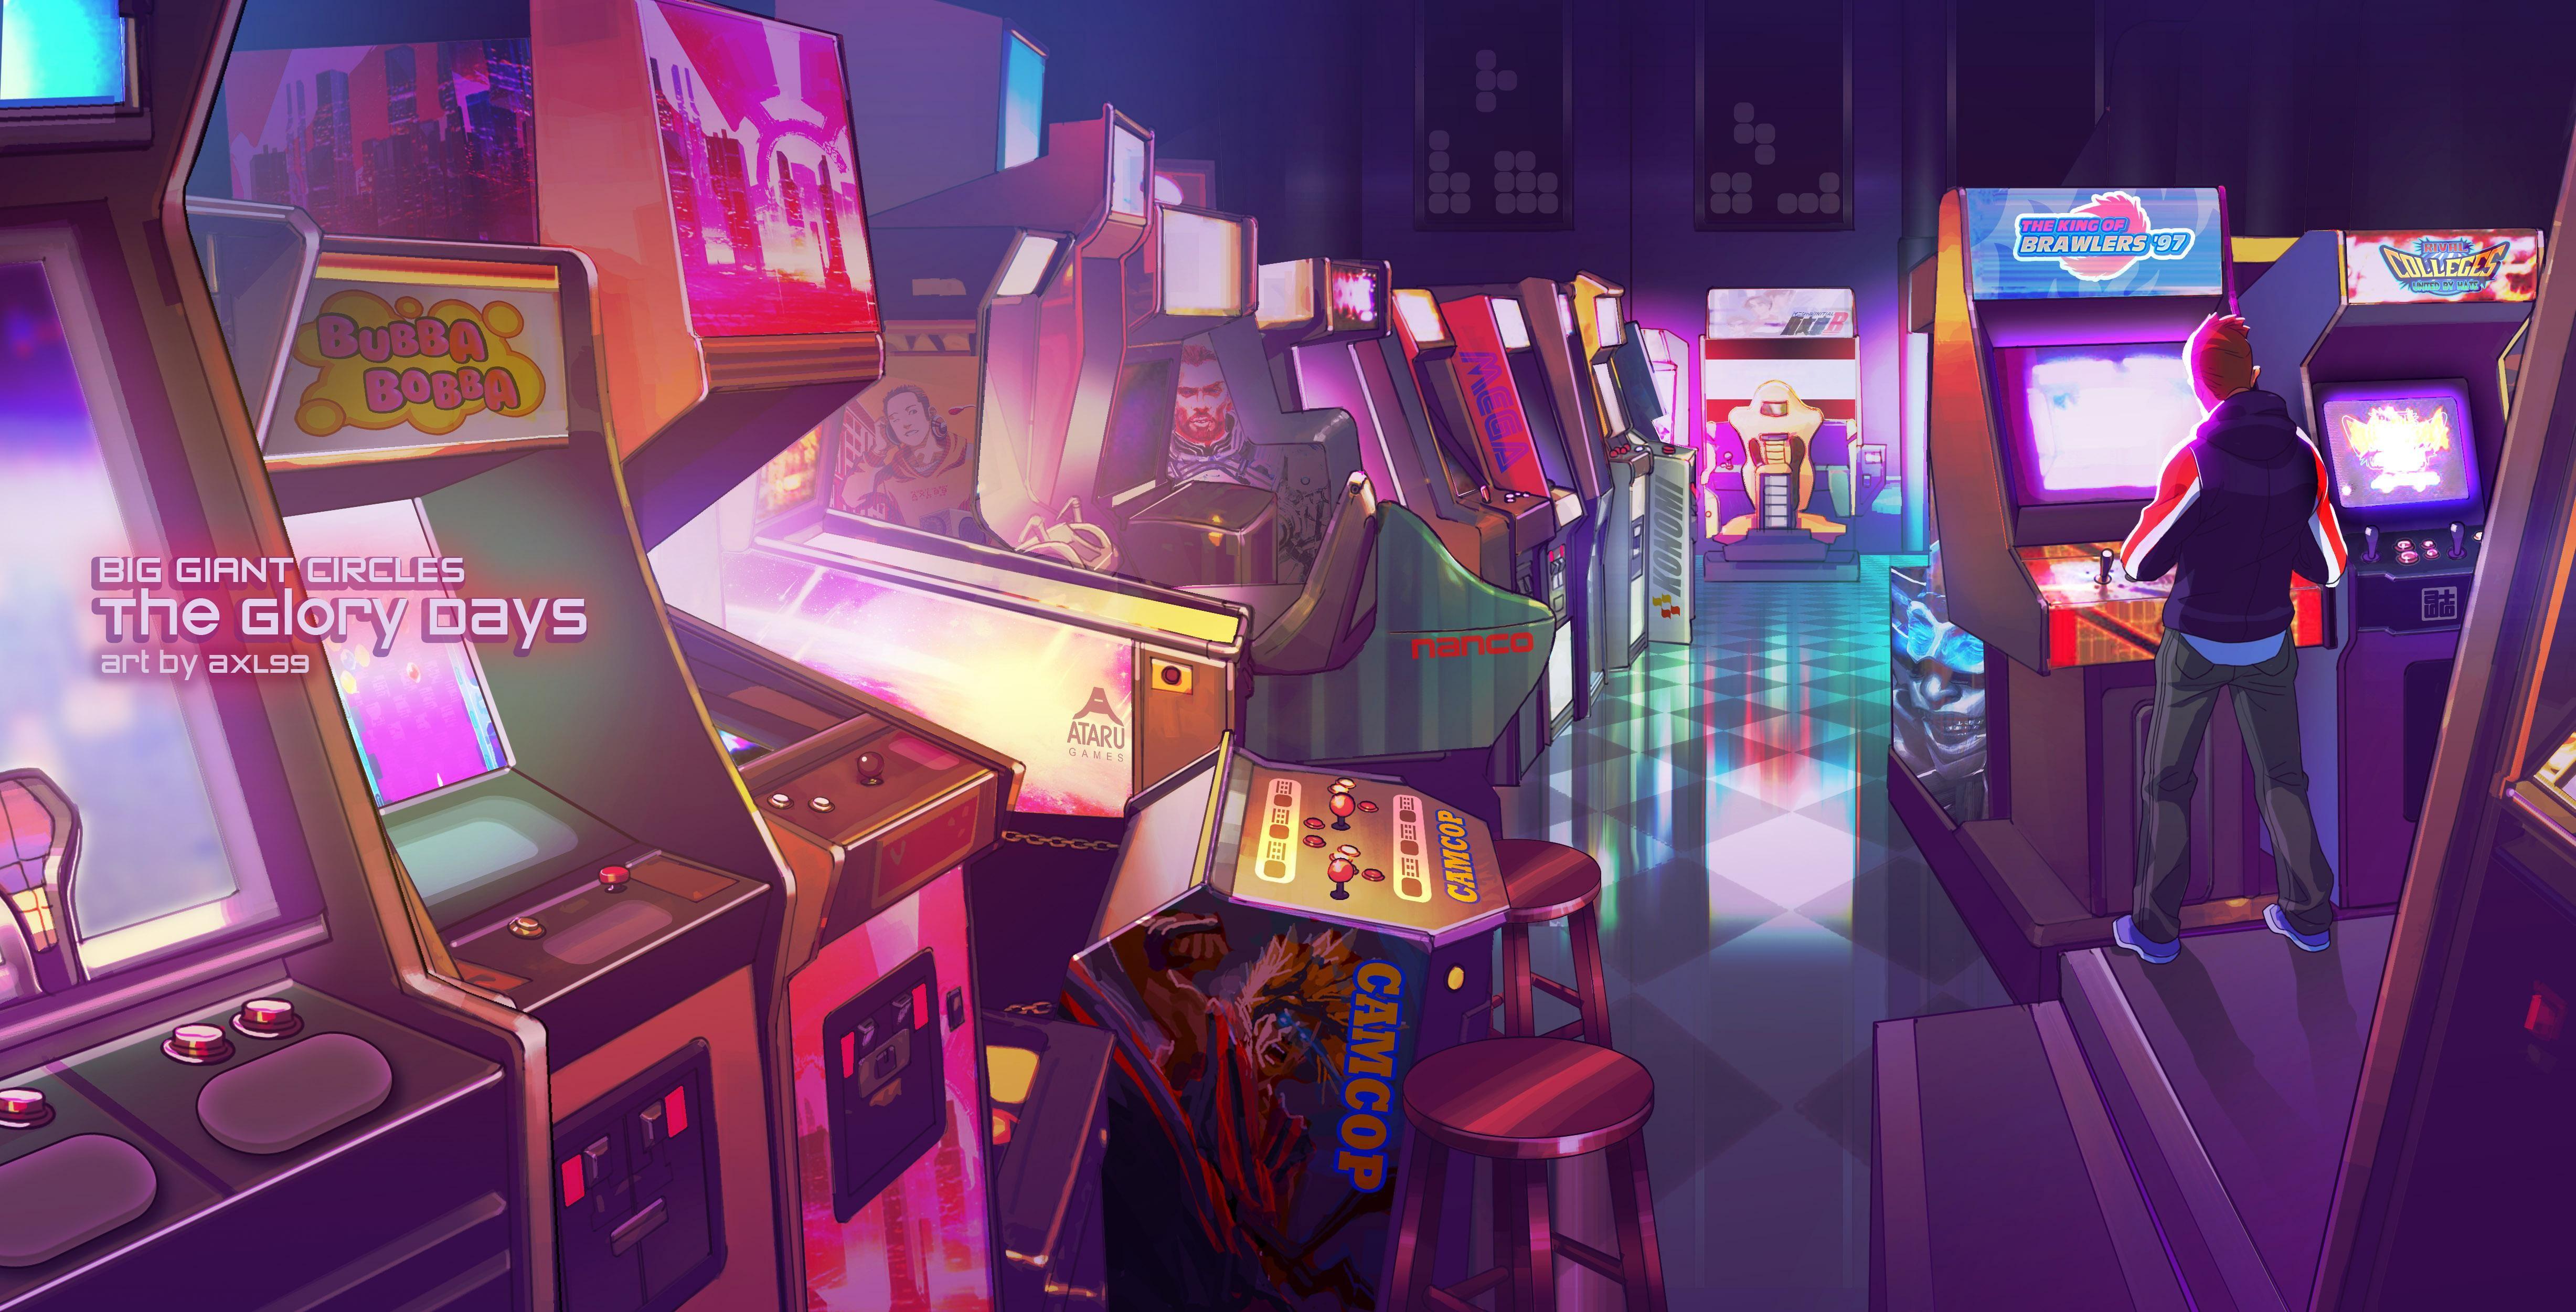 Arcade In 2020 Laptop Wallpaper Computer Wallpaper Retro Arcade